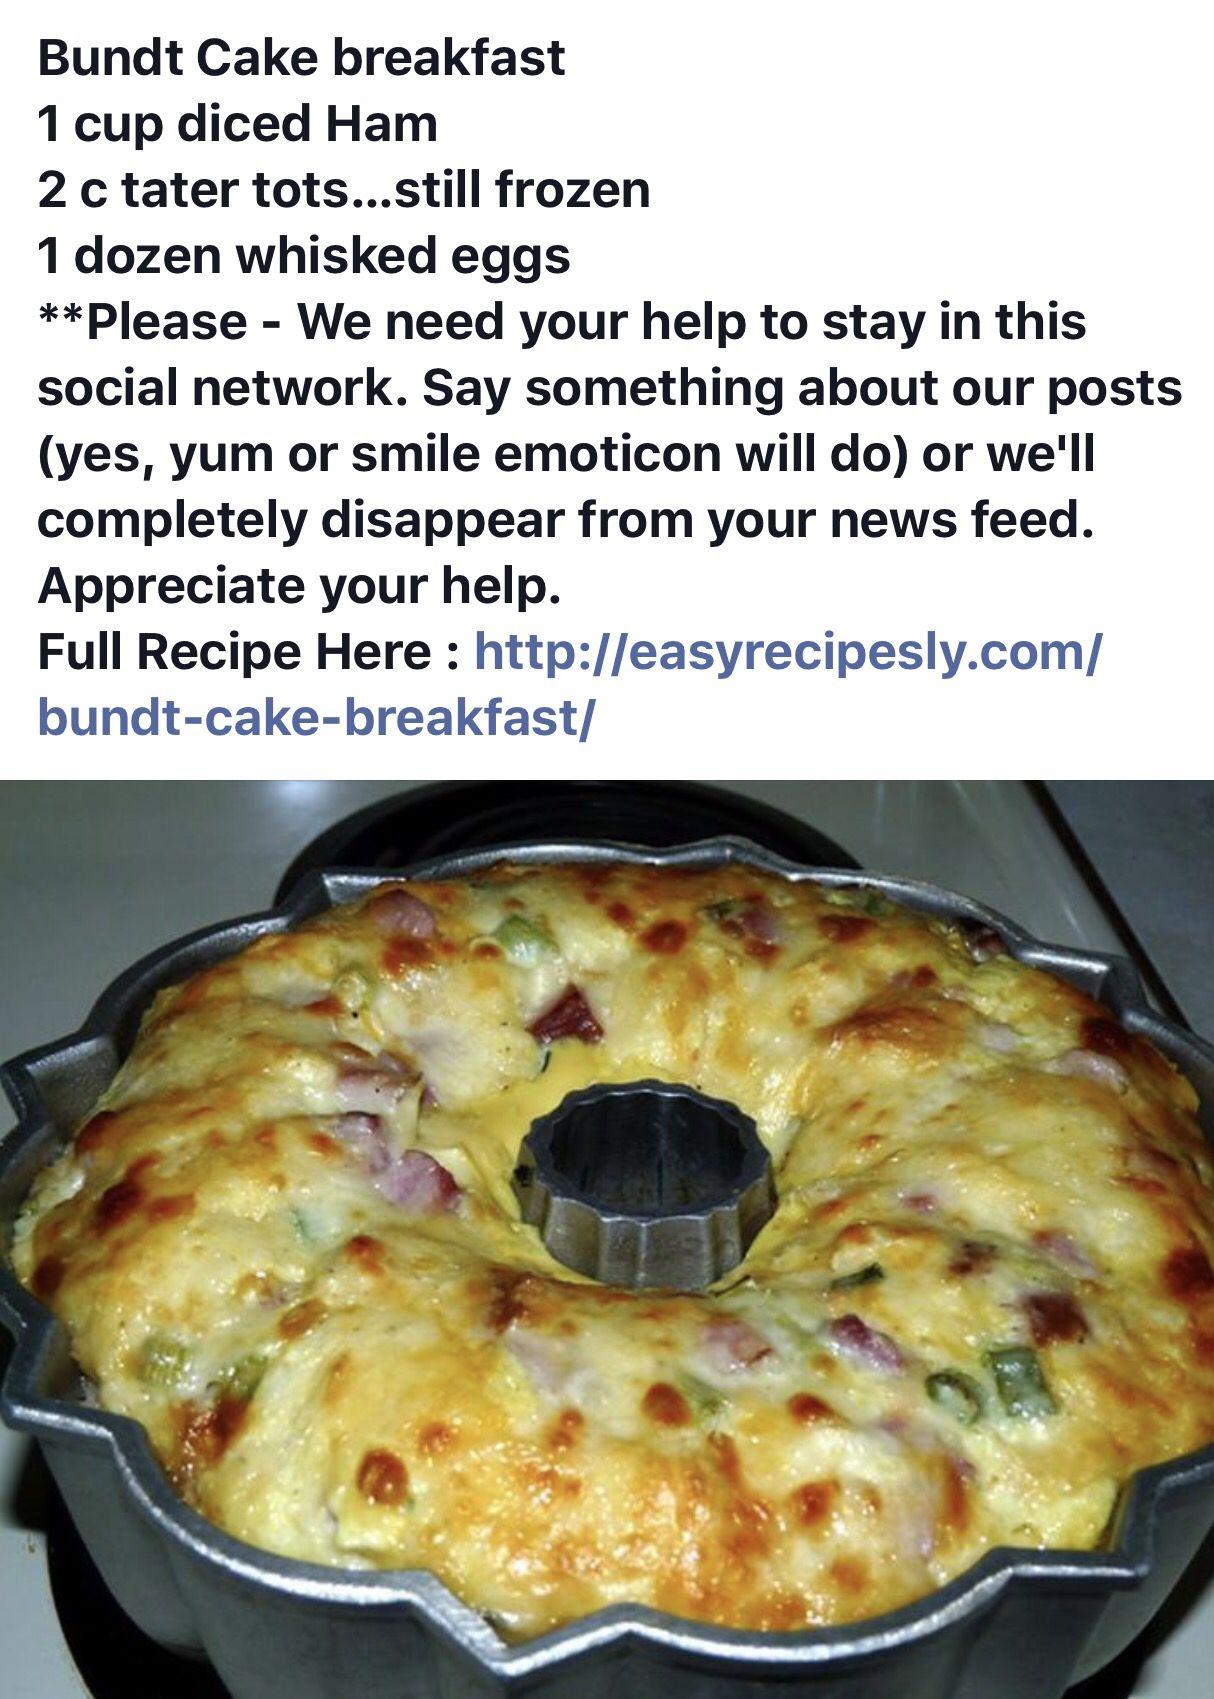 Http Easyrecipesly Com Bundt Cake Breakfast Breakfast Ingredients Cooking Recipes Easy Meals